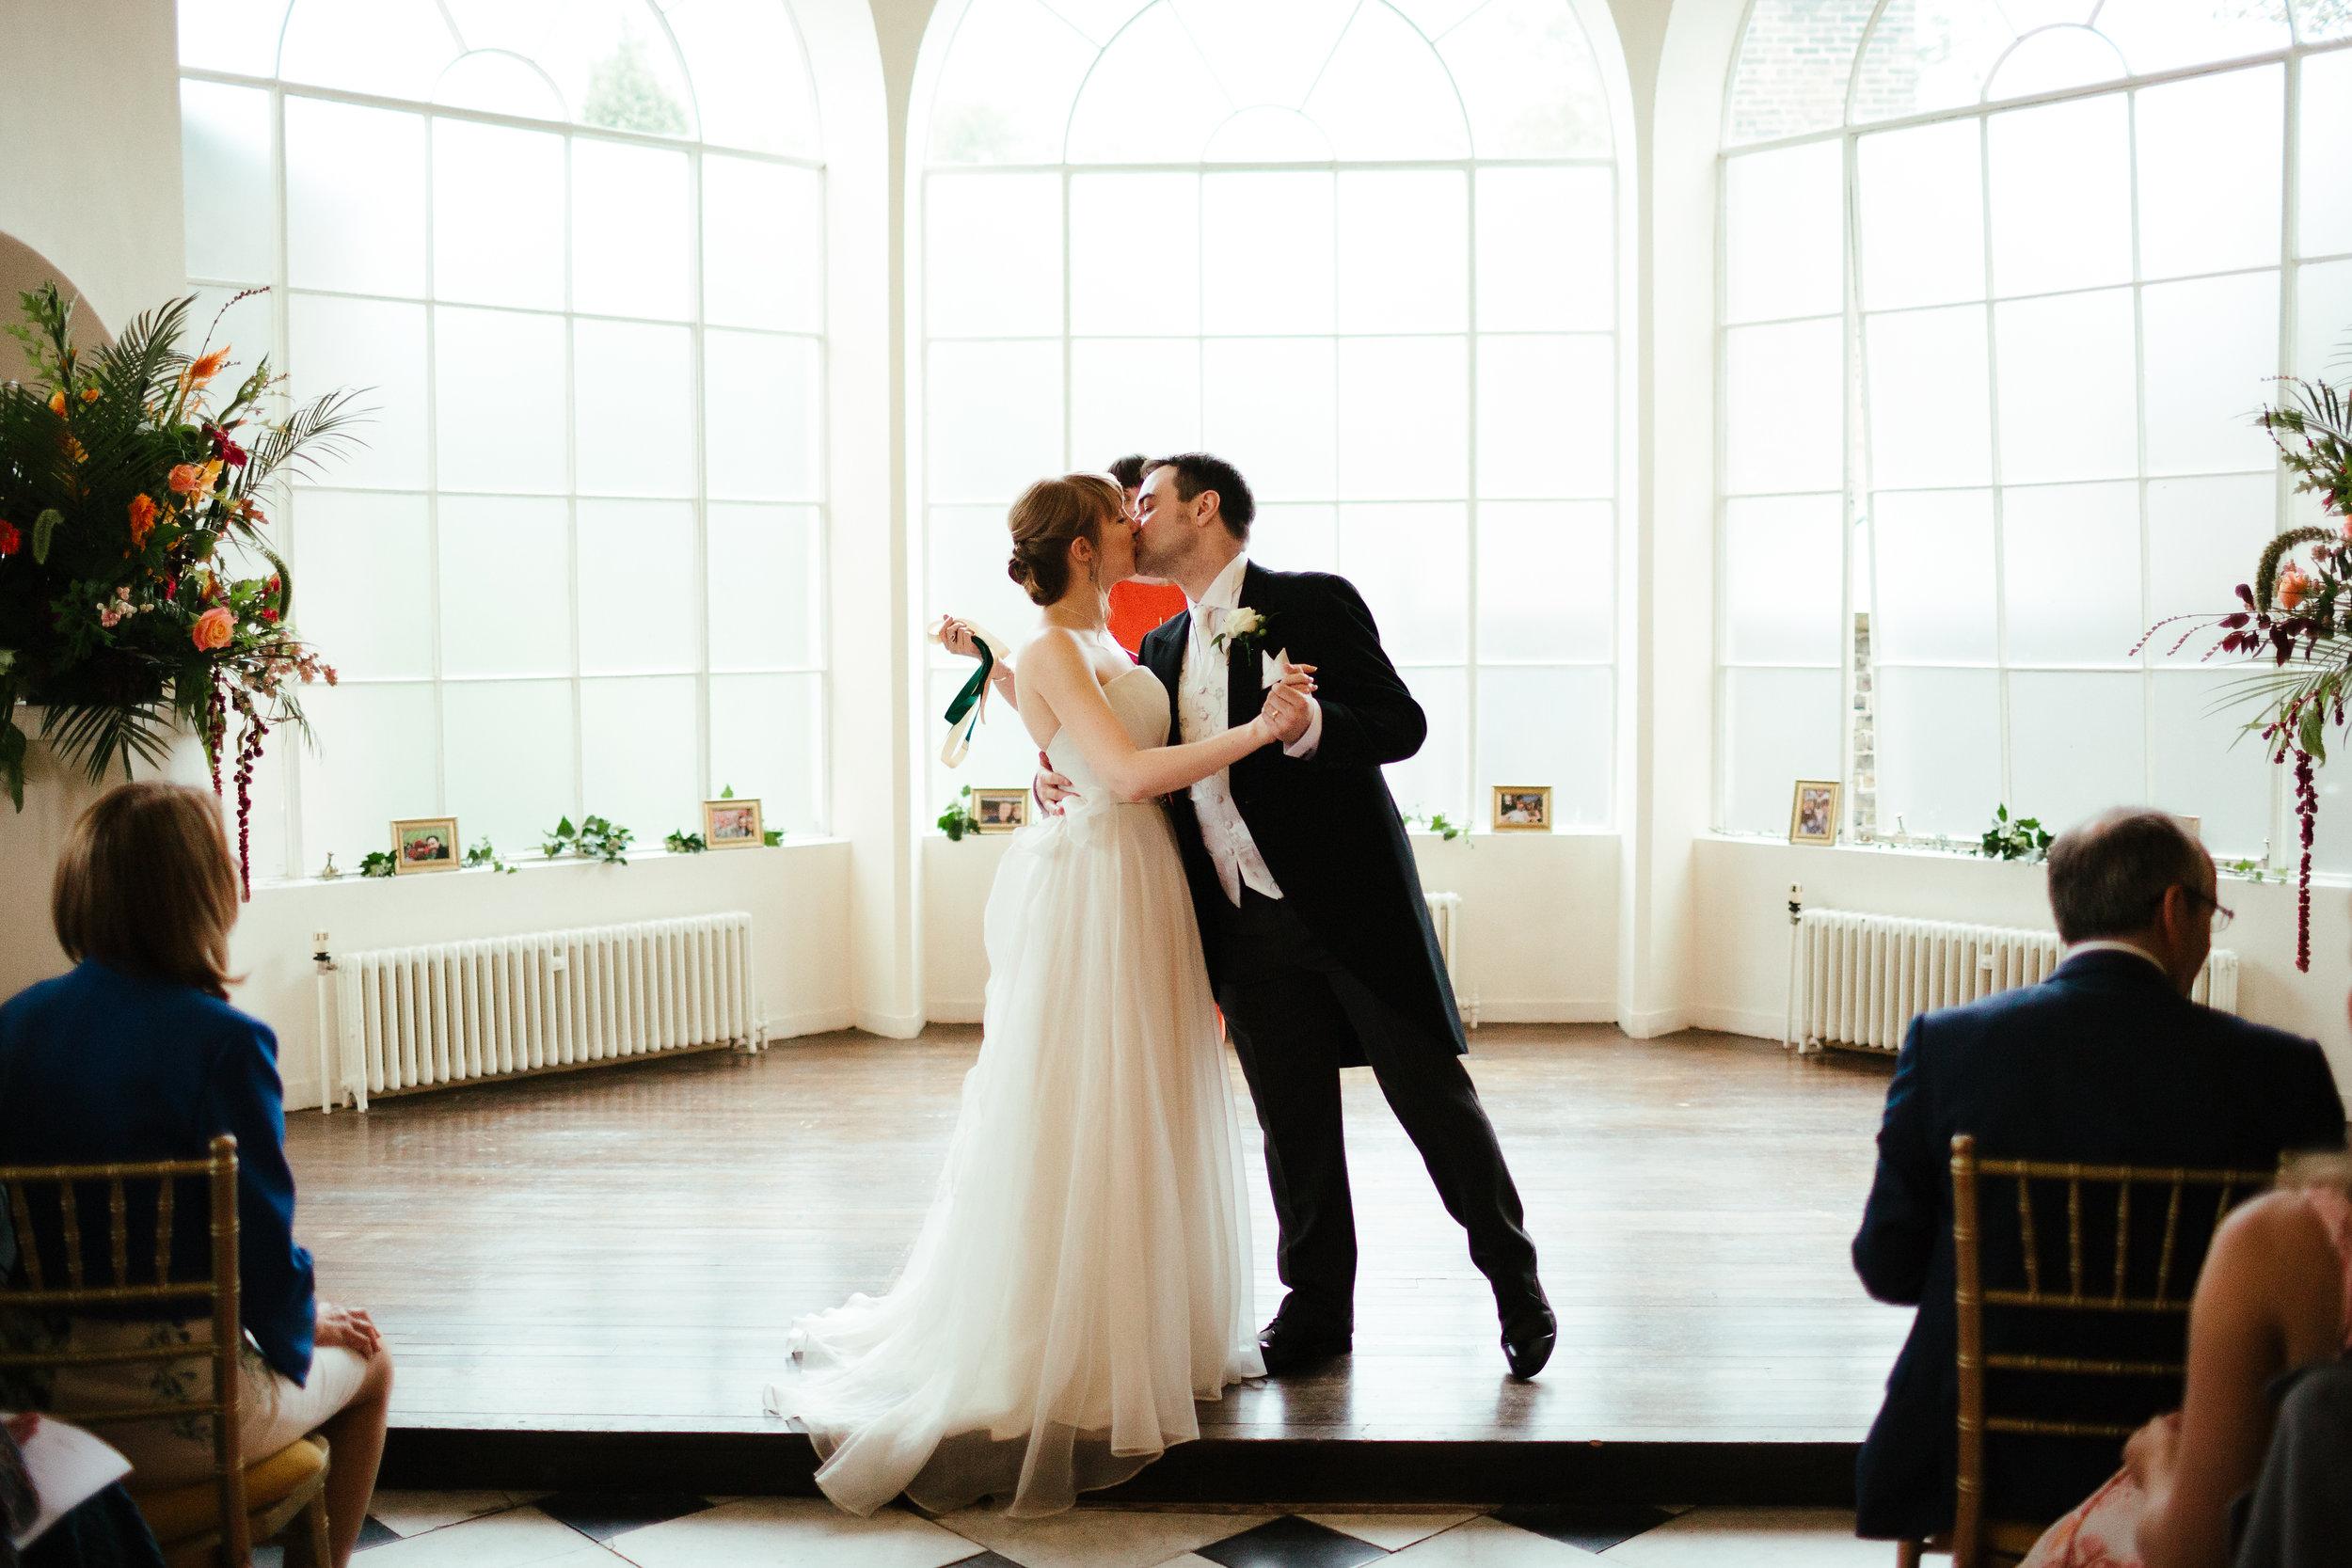 Sarah and Mark's Humanist Wedding Ceremony at Addington Palace, Croydon. Image by  Eneka Stewart Photography